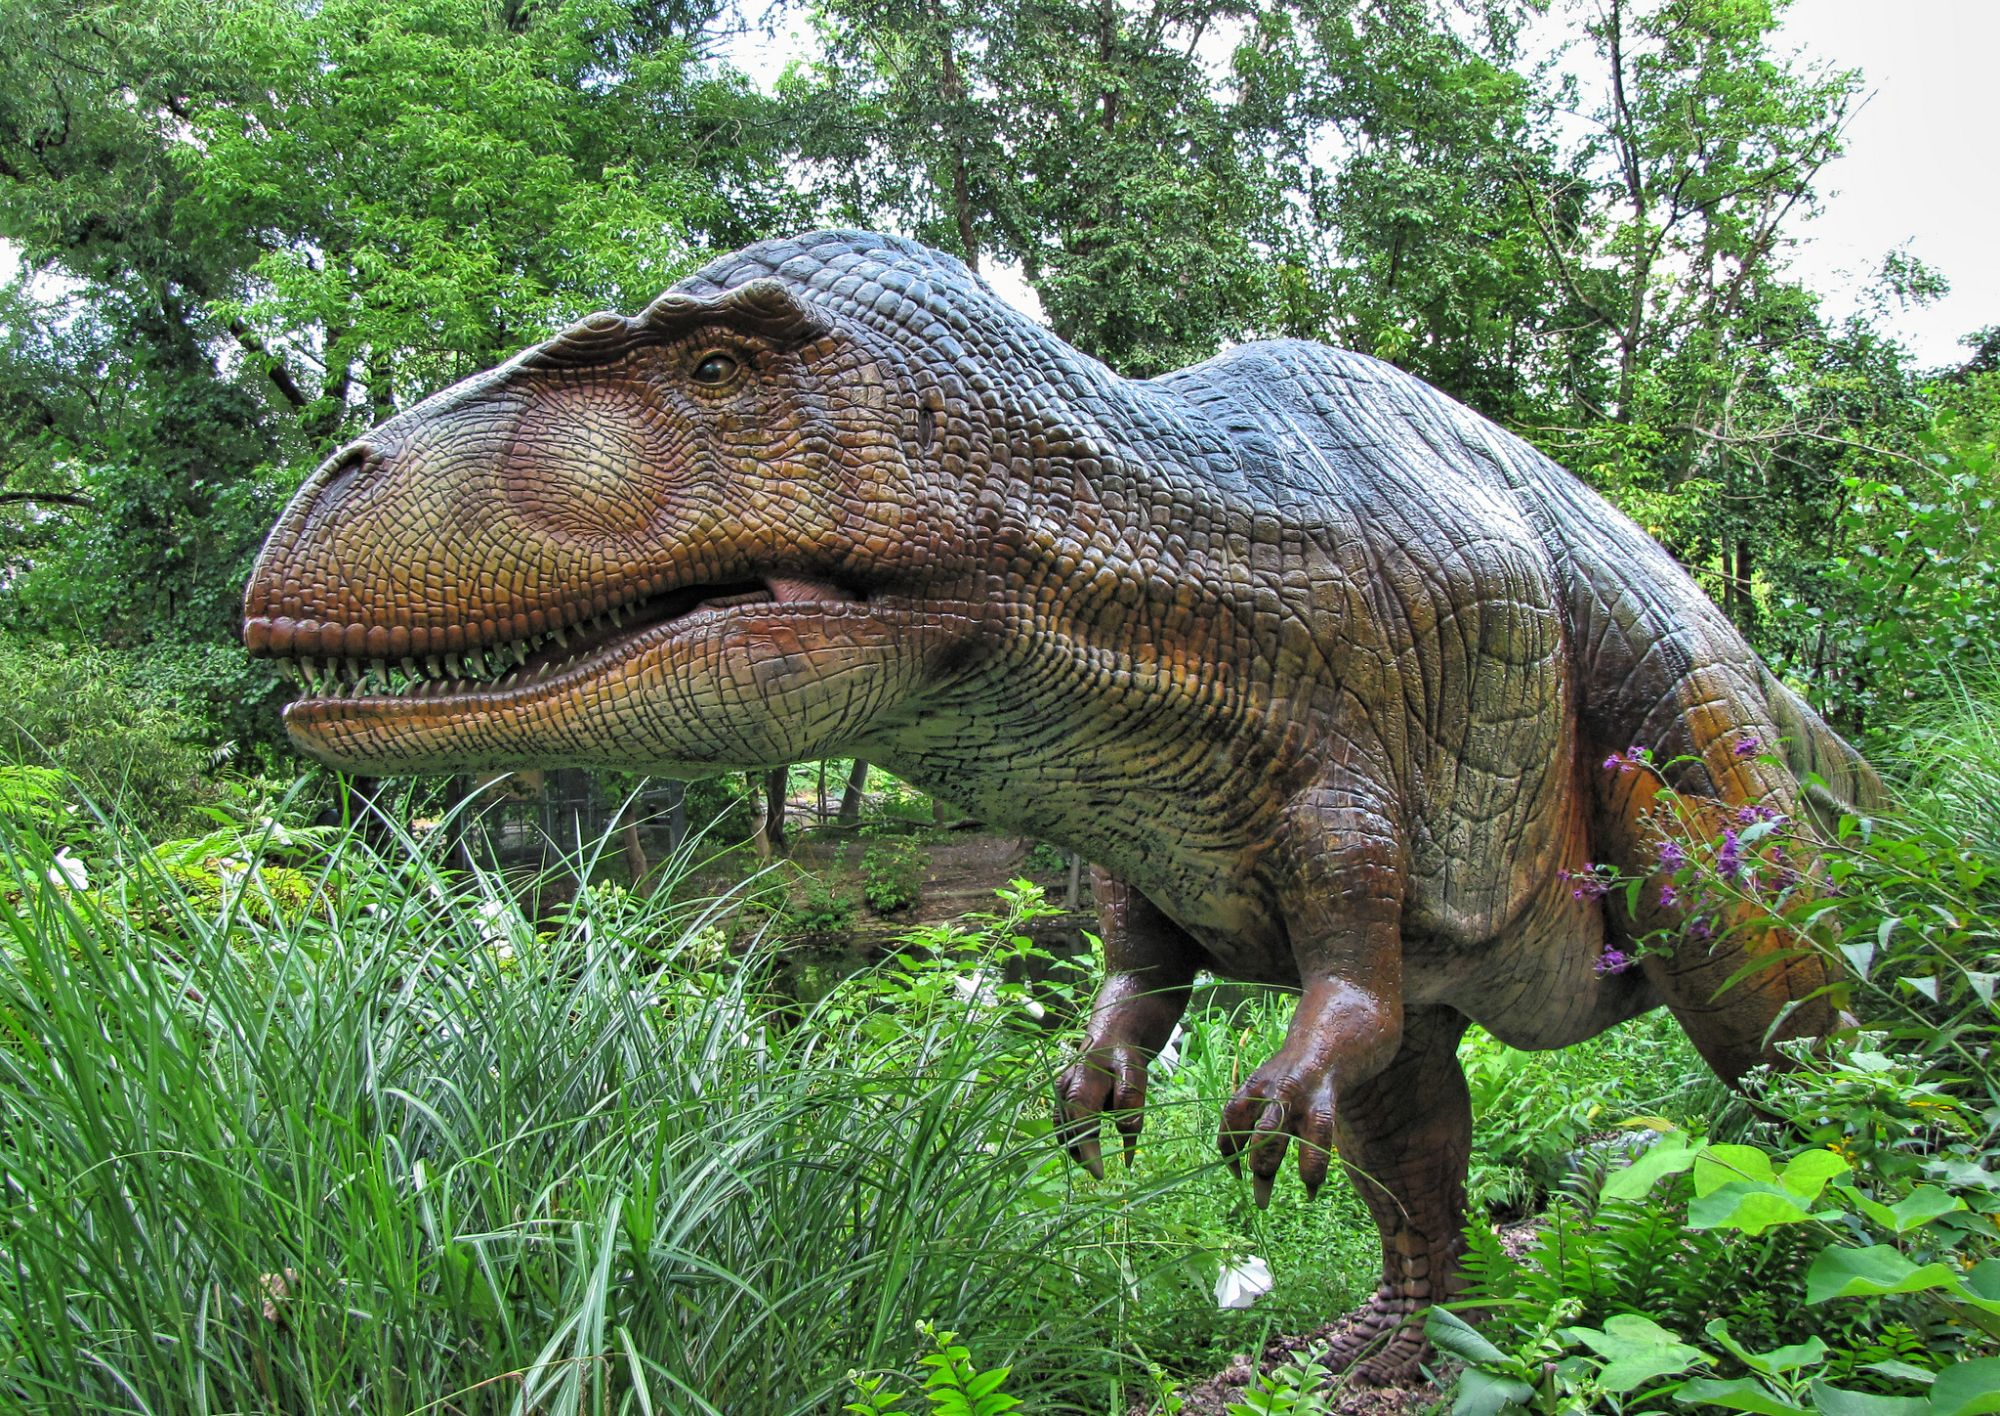 Sauropodit